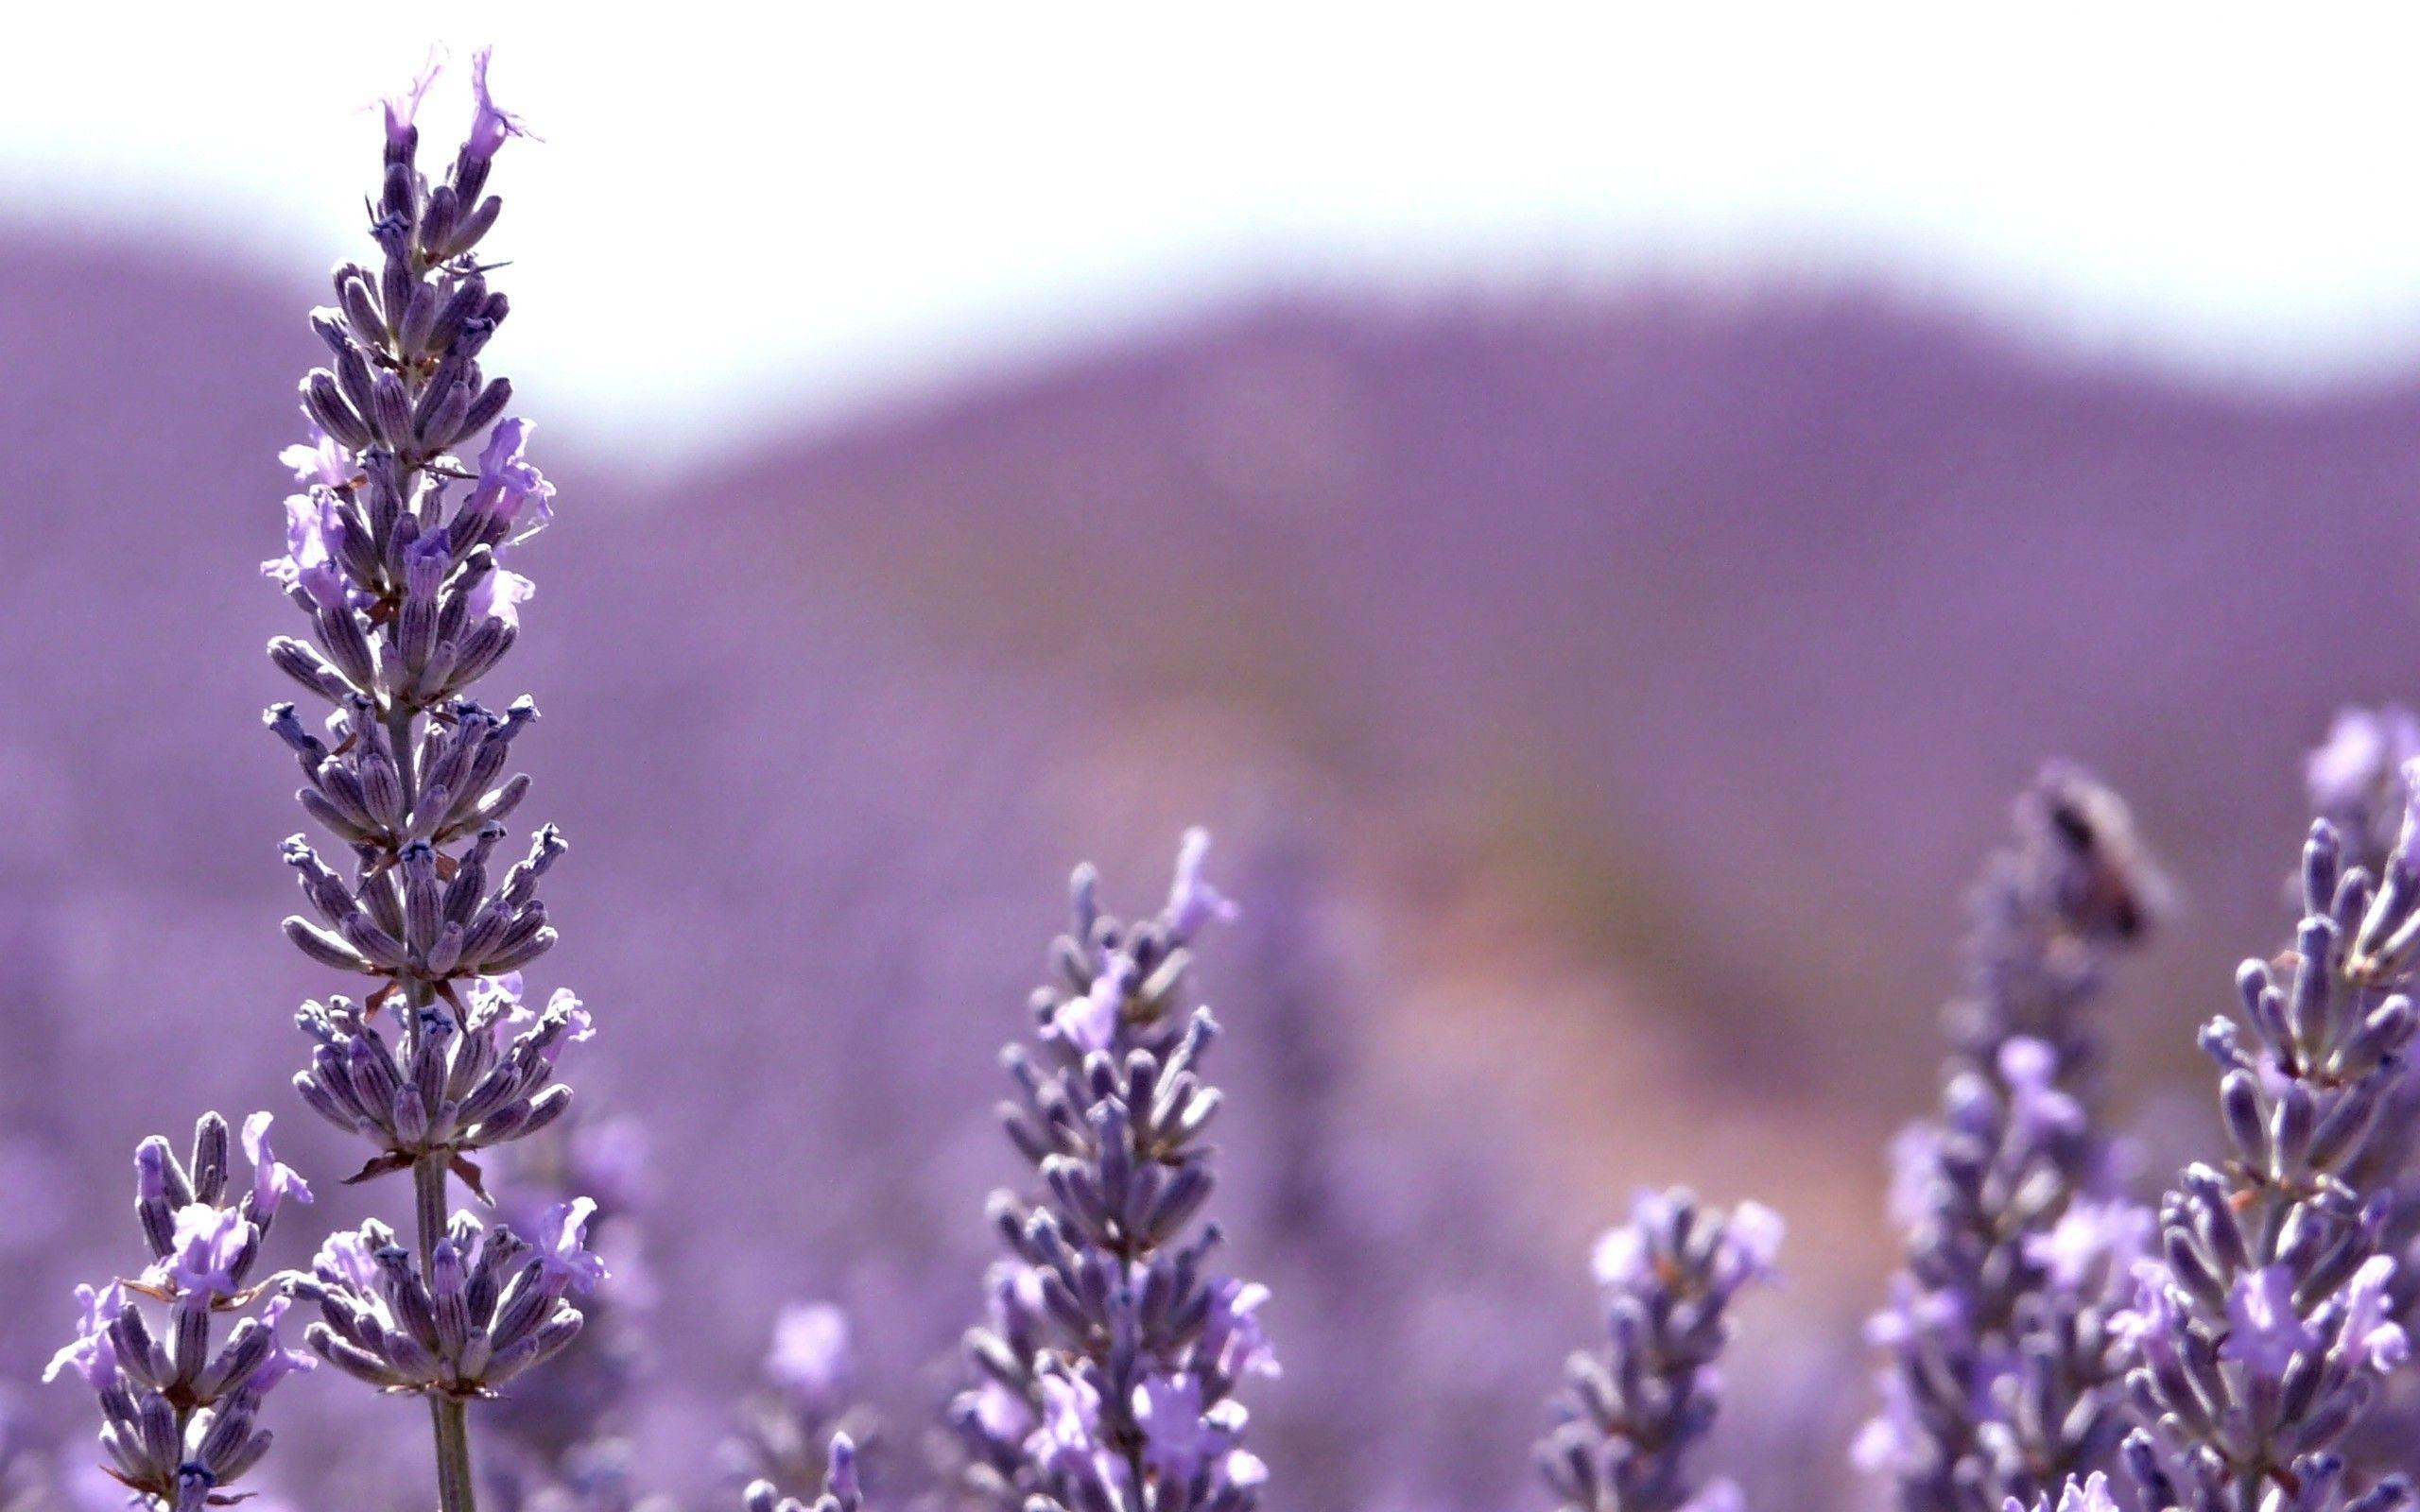 Kumpulan Lavender Flower Wallpaper Hd   wallpaper mobil